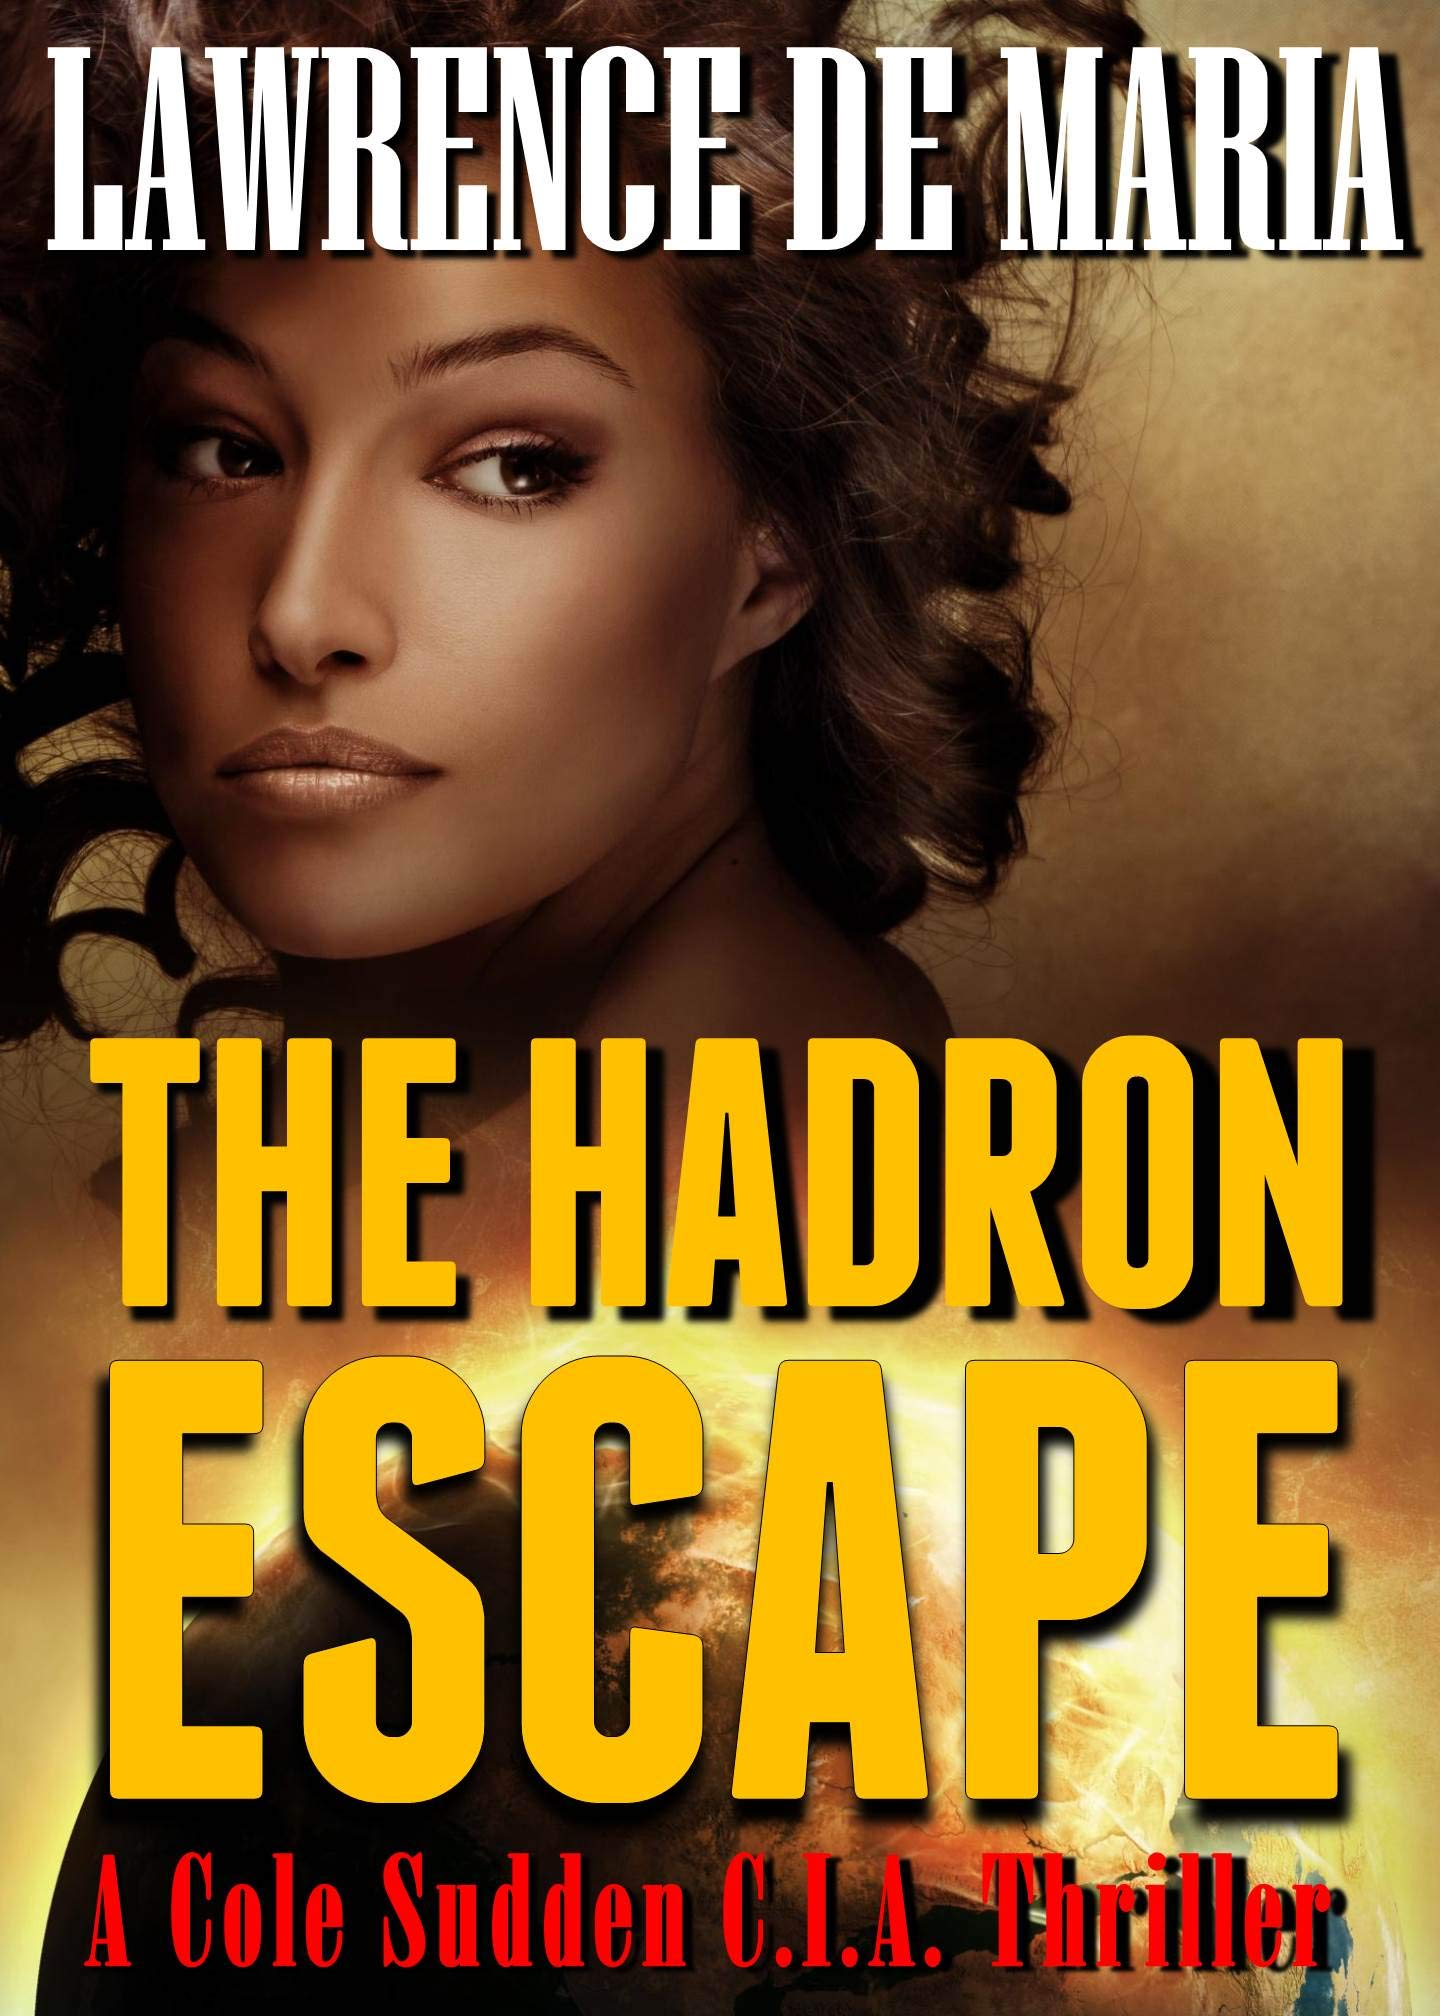 THE HADRON ESCAPE: A Cole Sudden C.I.A. Action Thriller (COLE SUDDEN CIA THRILLERS Book 2)